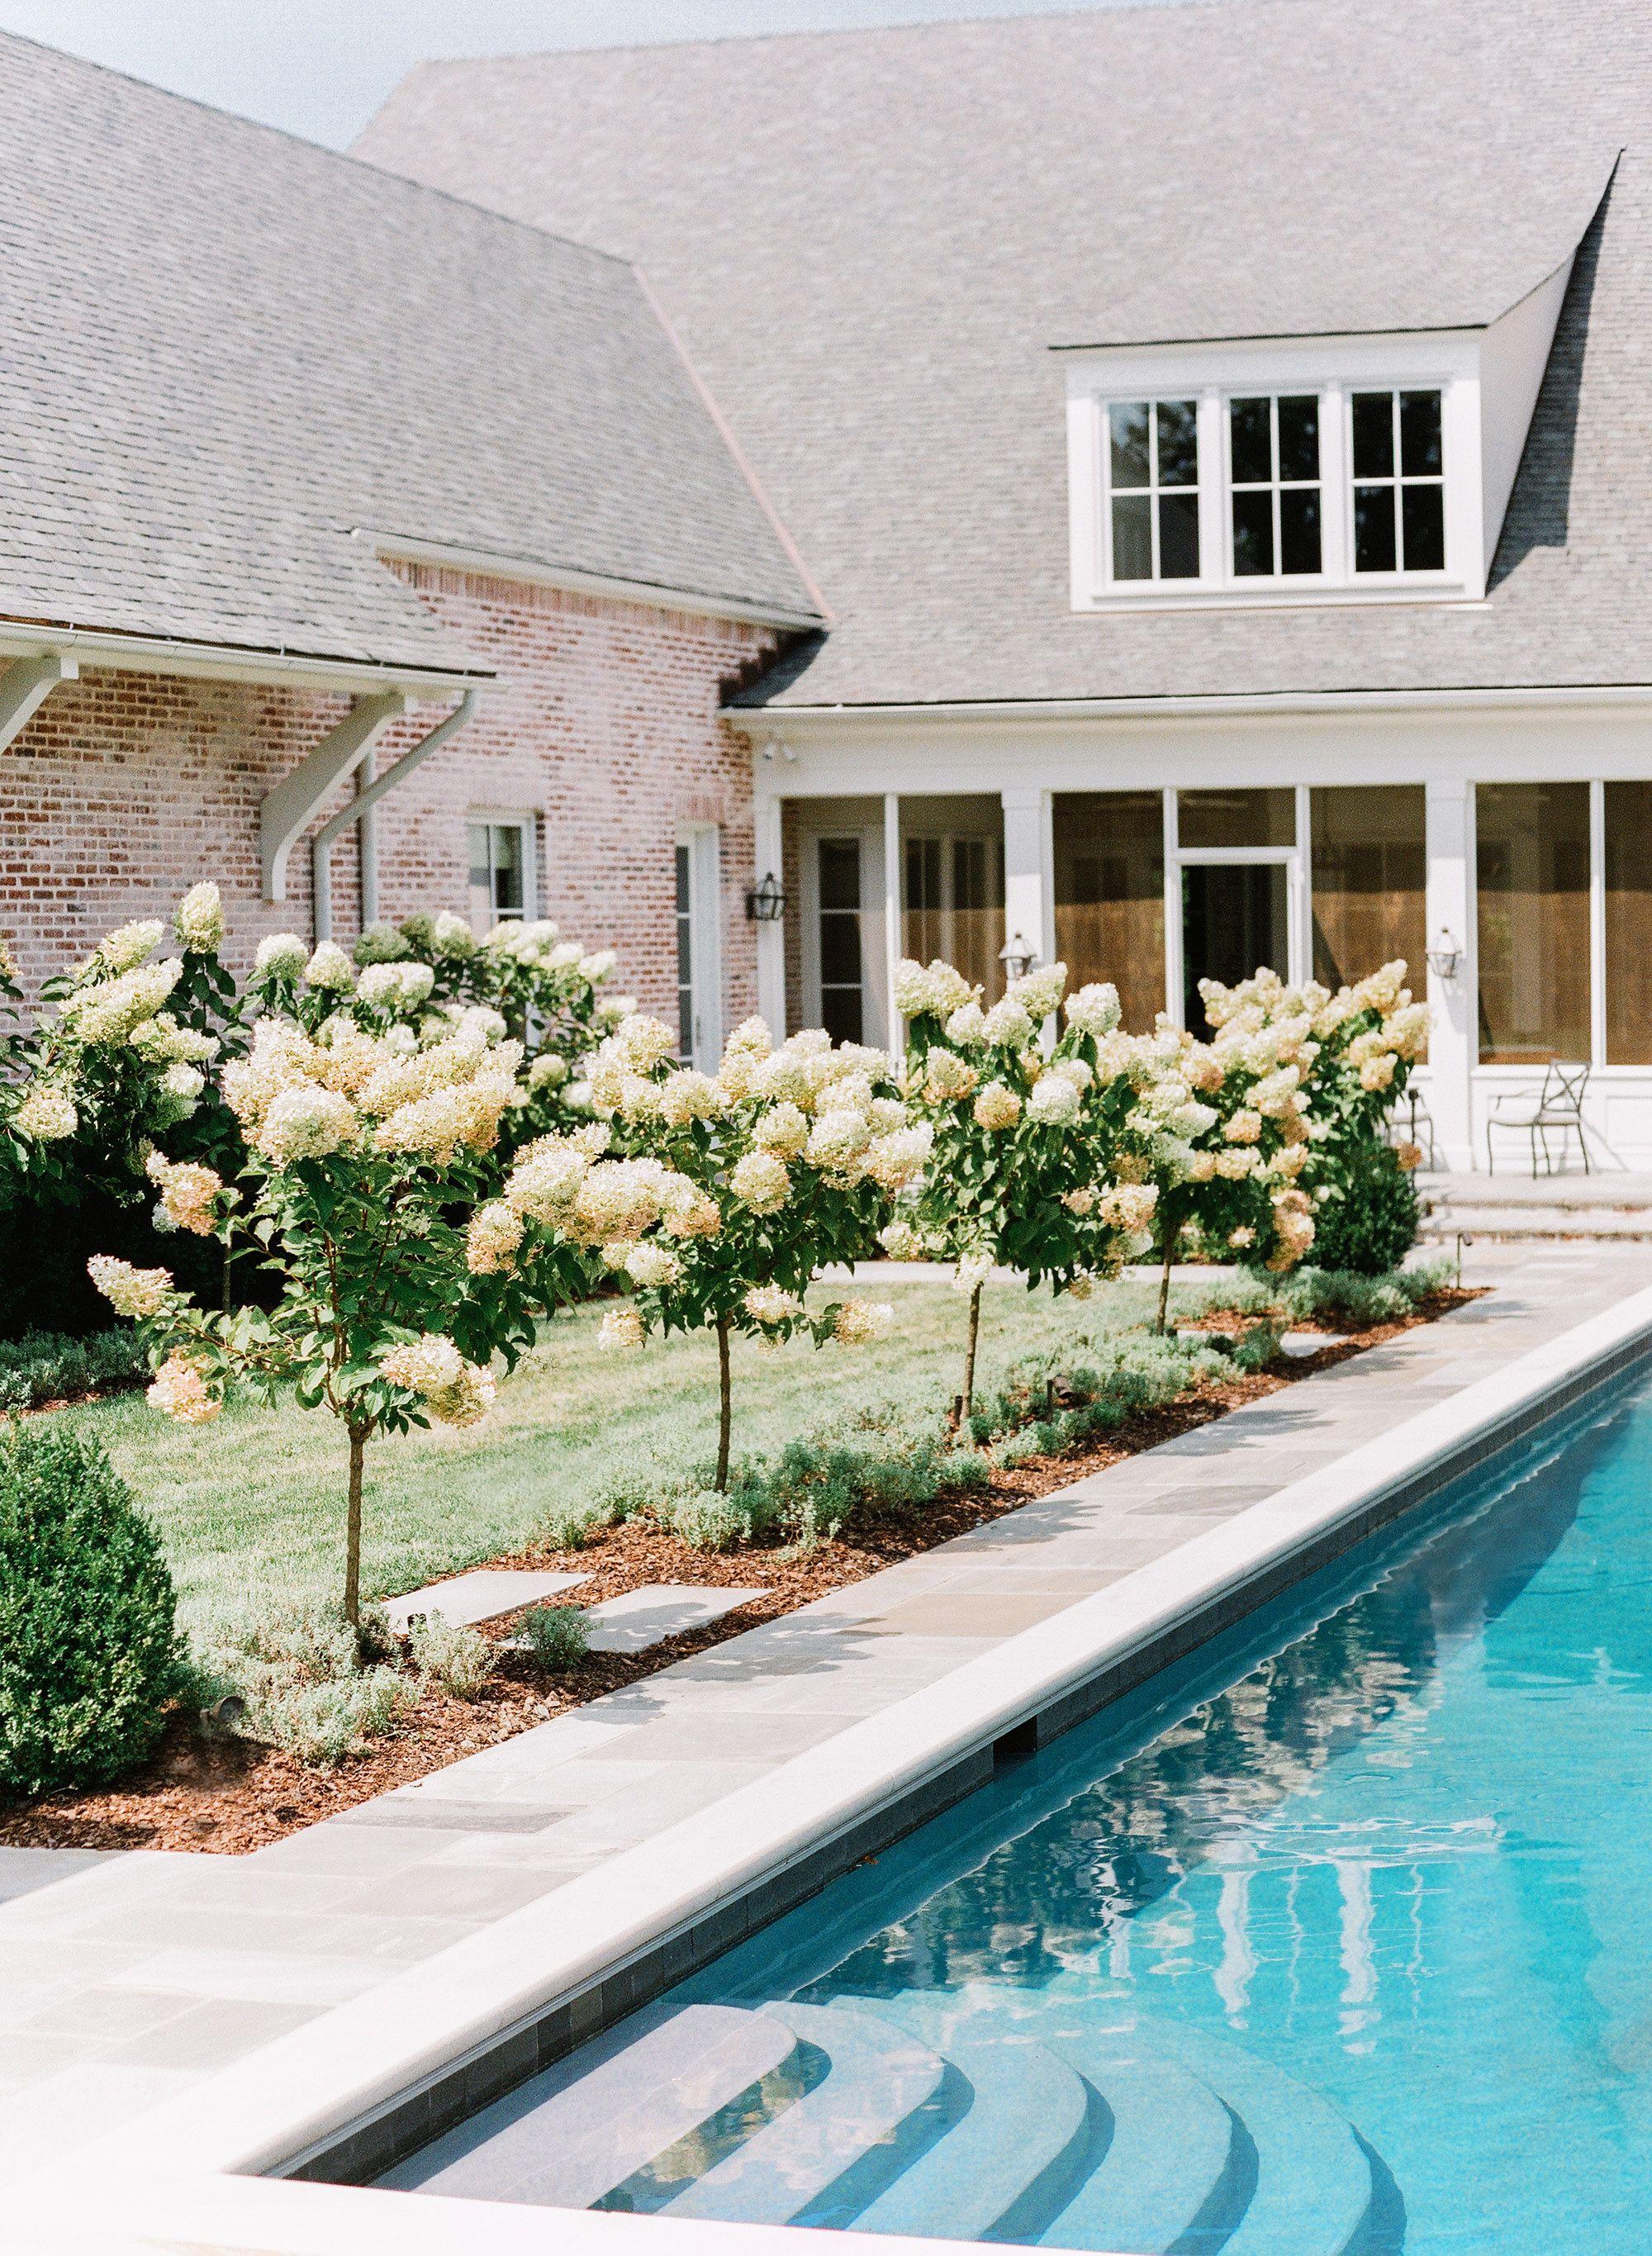 landscape architecture by anne daigh nashville tn pool design